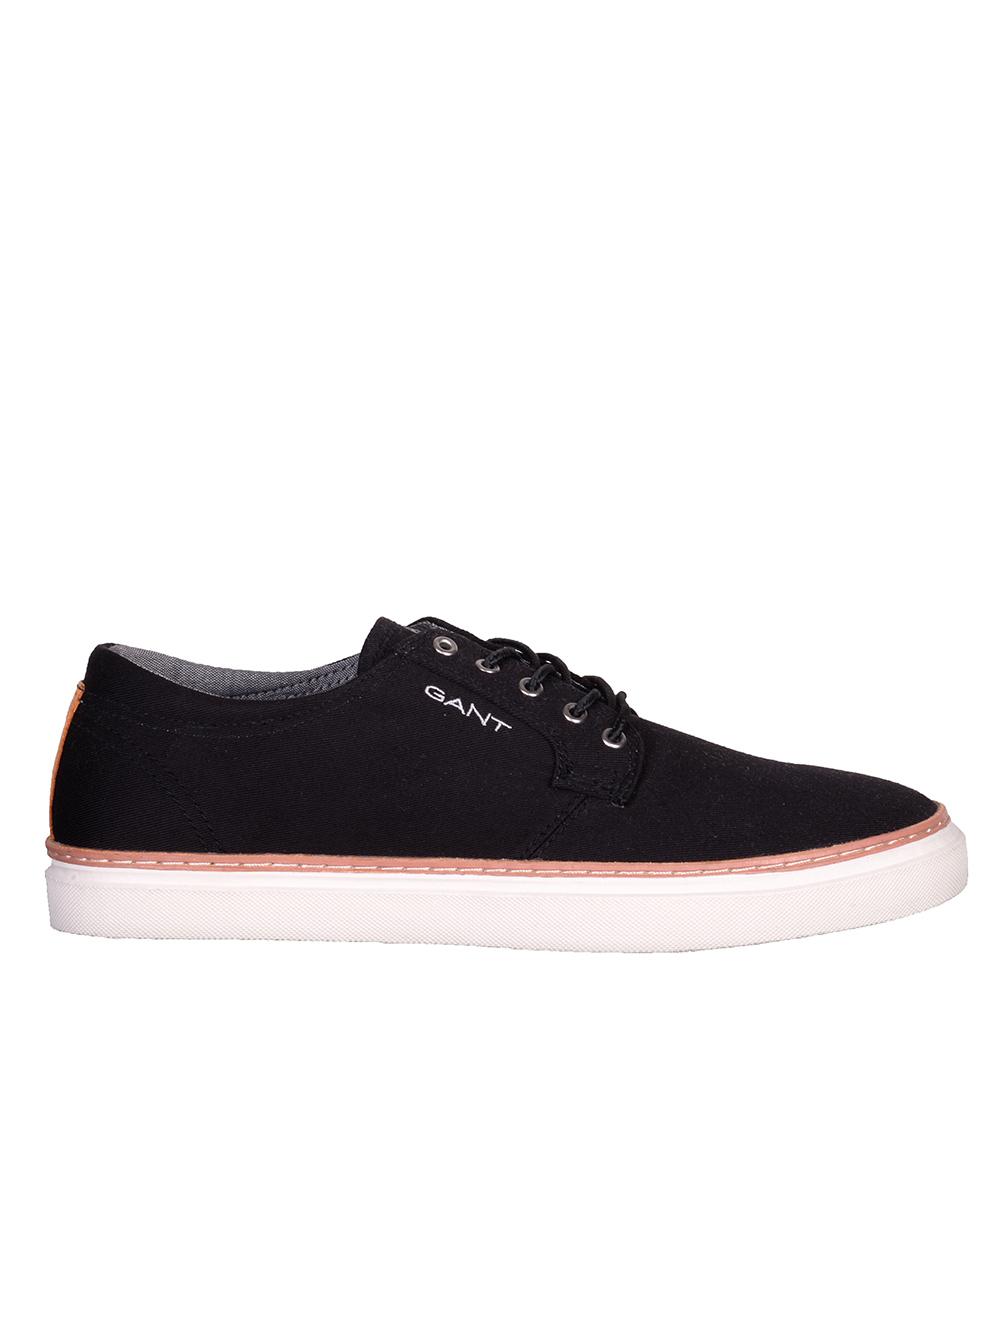 GANT Παπούτσια sneakers 3GS22638666-0 ΜΑΥΡΟ